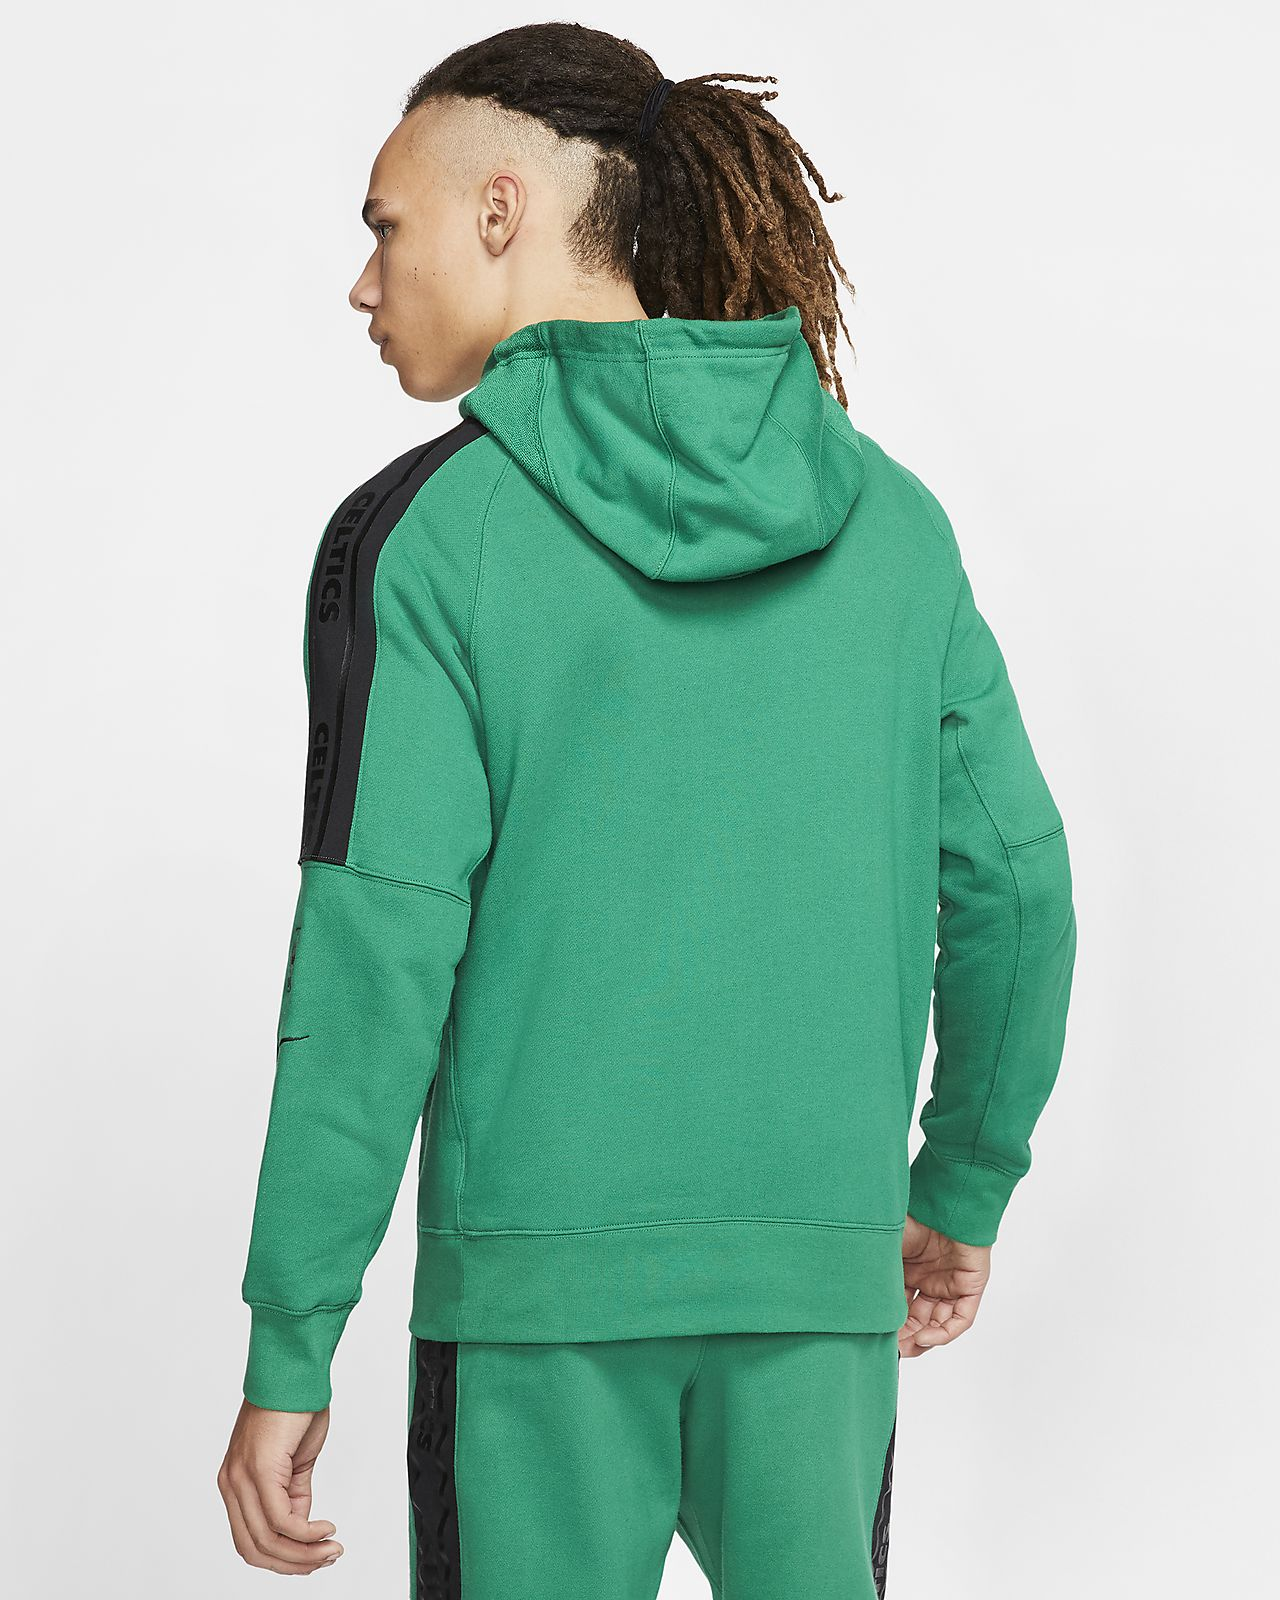 Nike NBA Boston Celtics Showtime Hoodie NBA Shop Boston